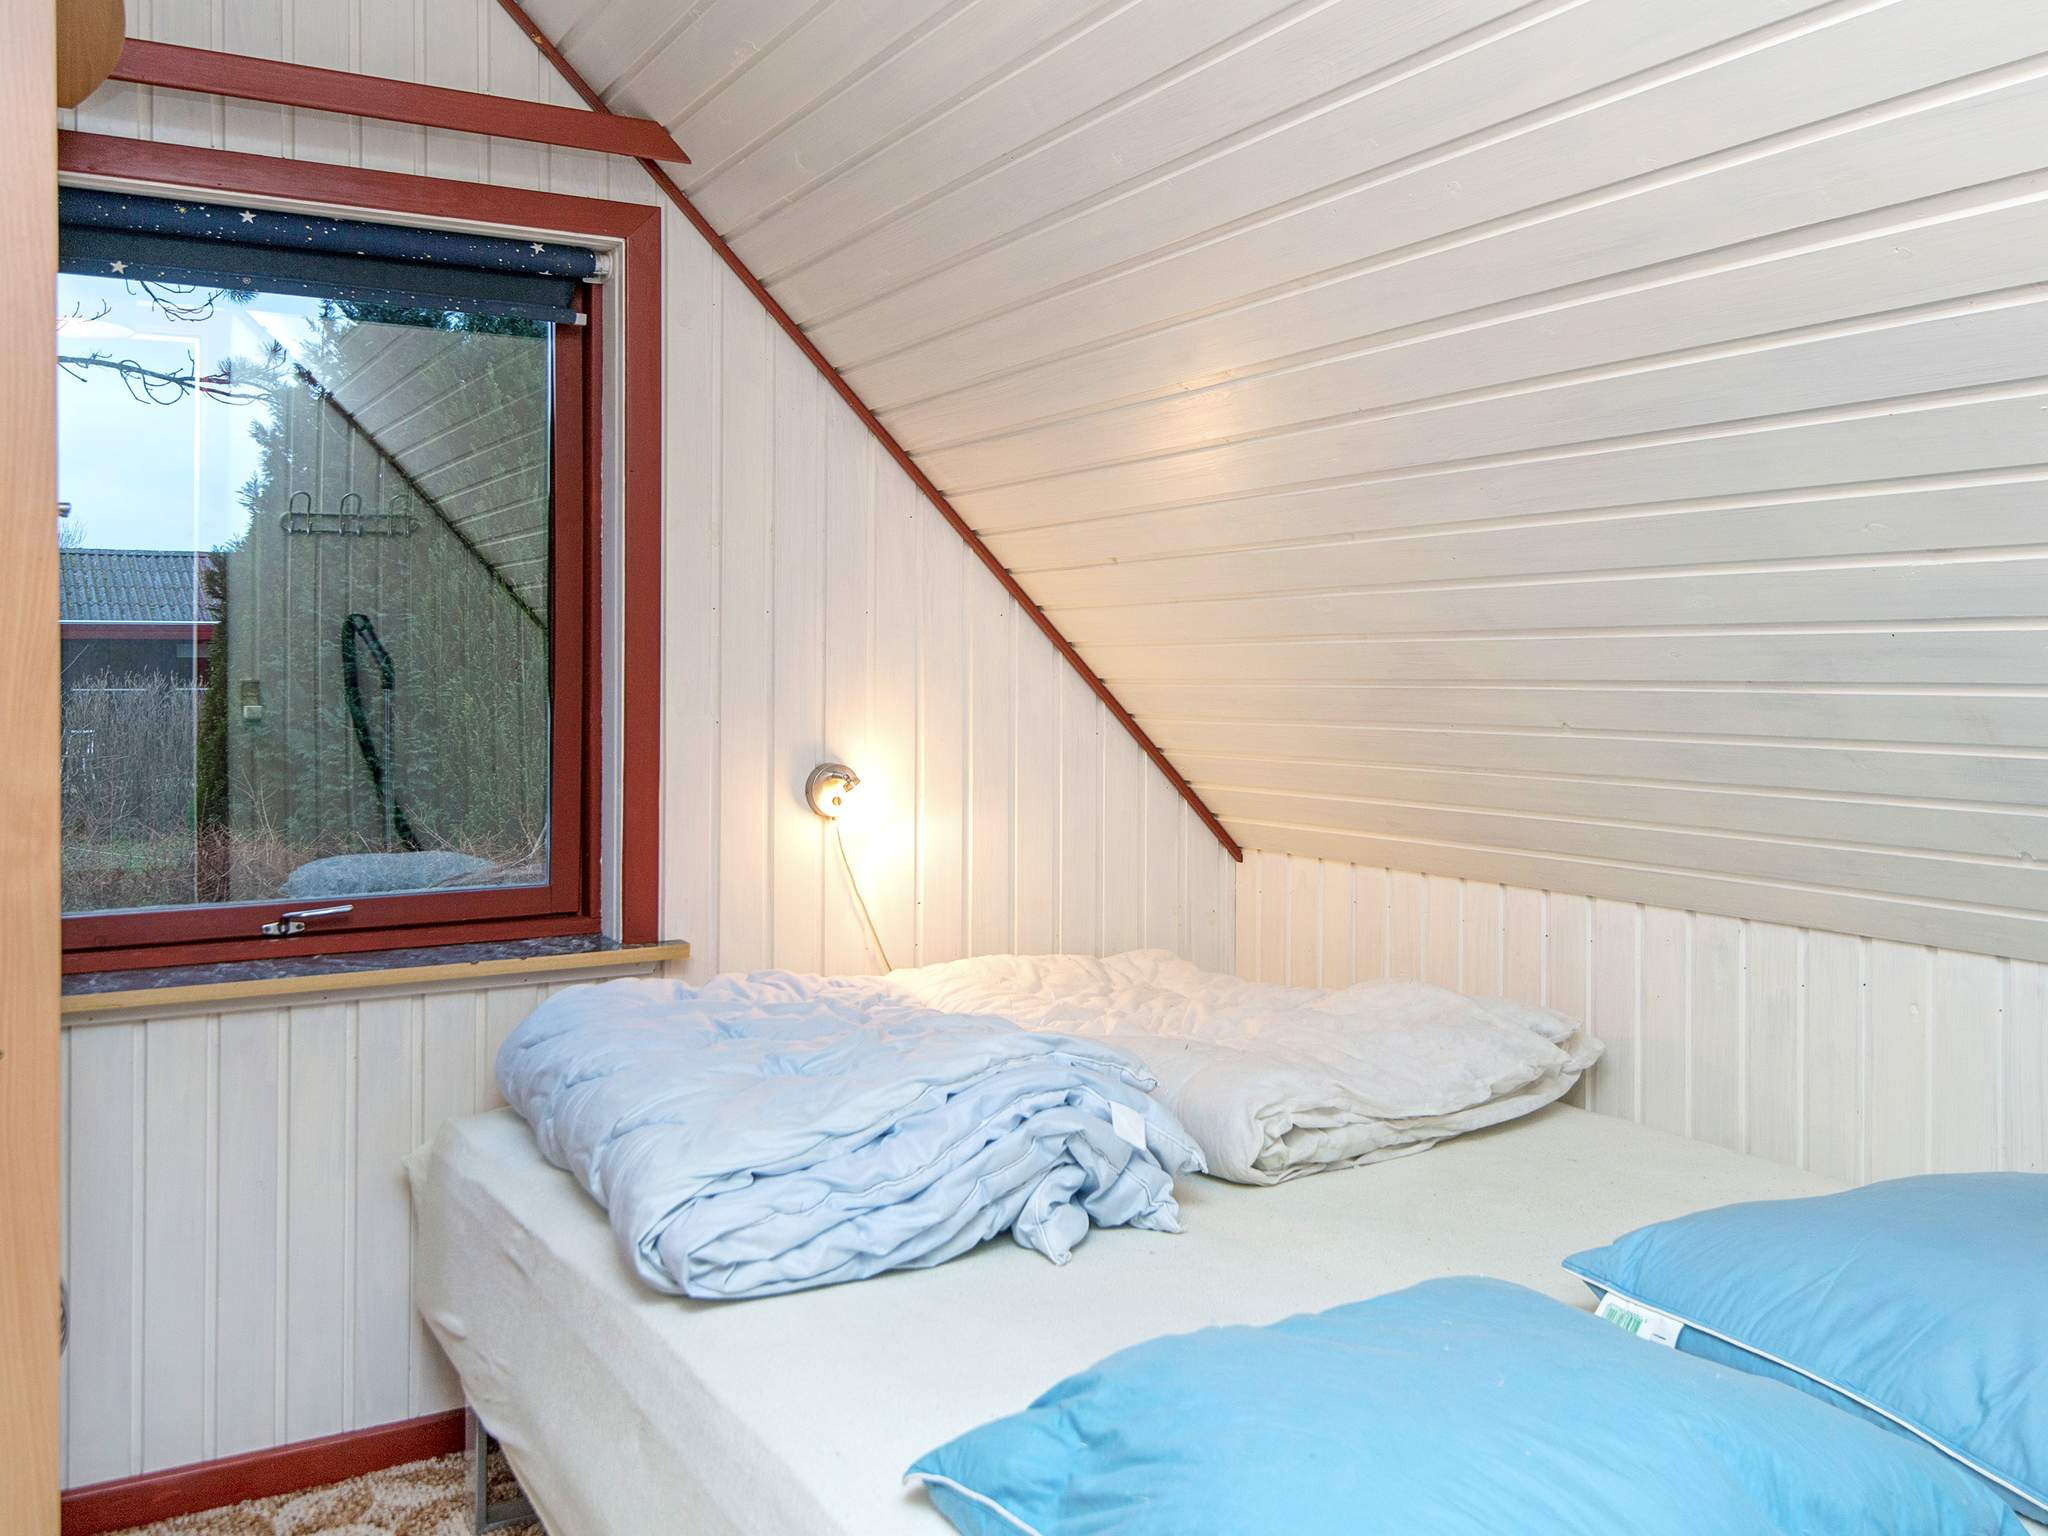 Ferienhaus Handrup Bakker (83185), Handrup, , Ostjütland, Dänemark, Bild 10